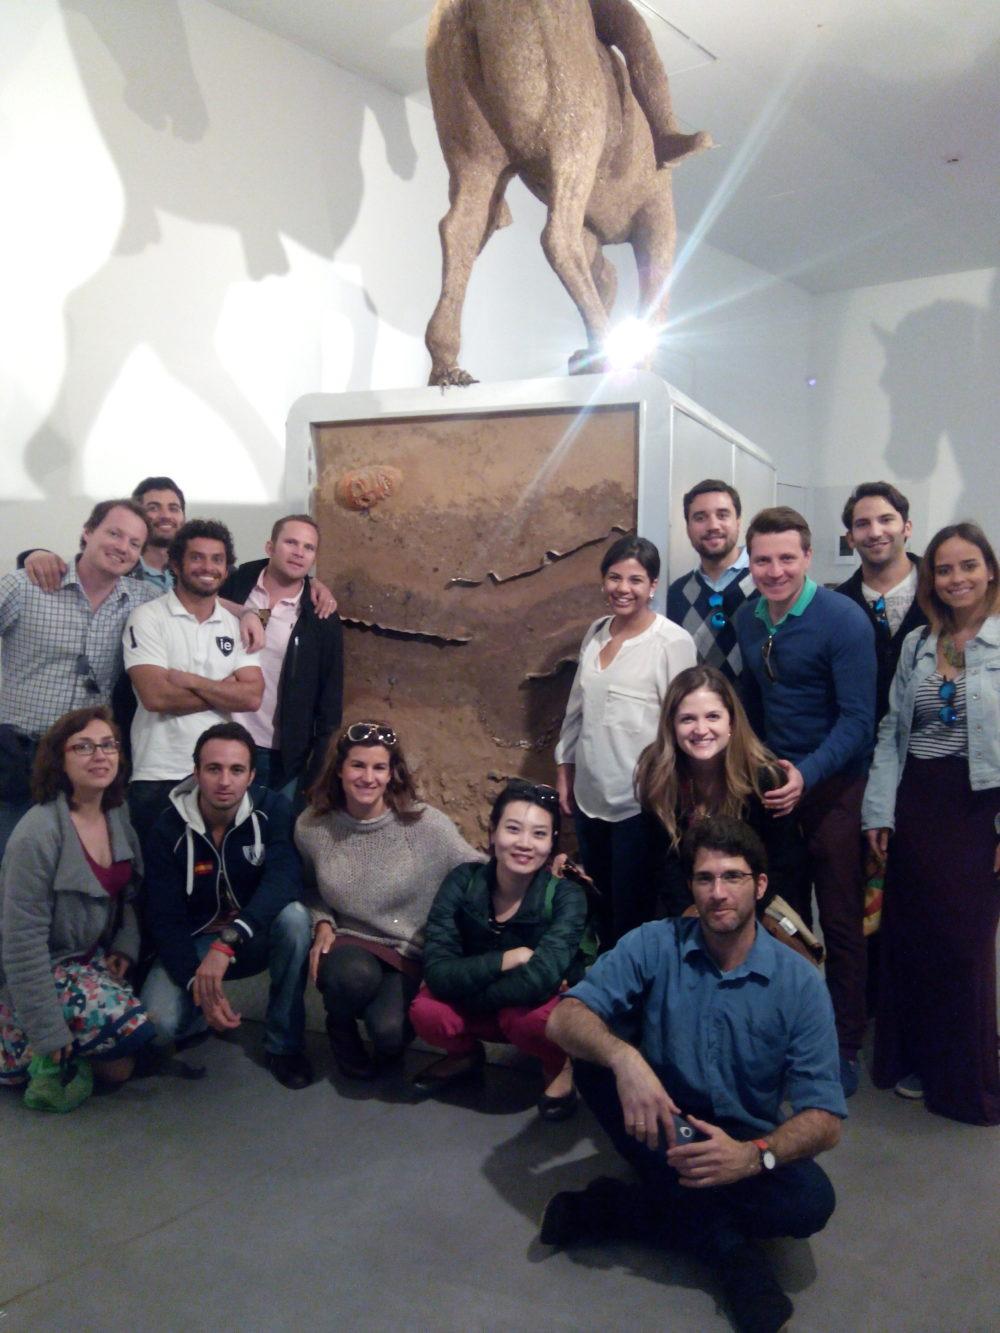 VentureLab visit to Petach Tikva Museum of Art